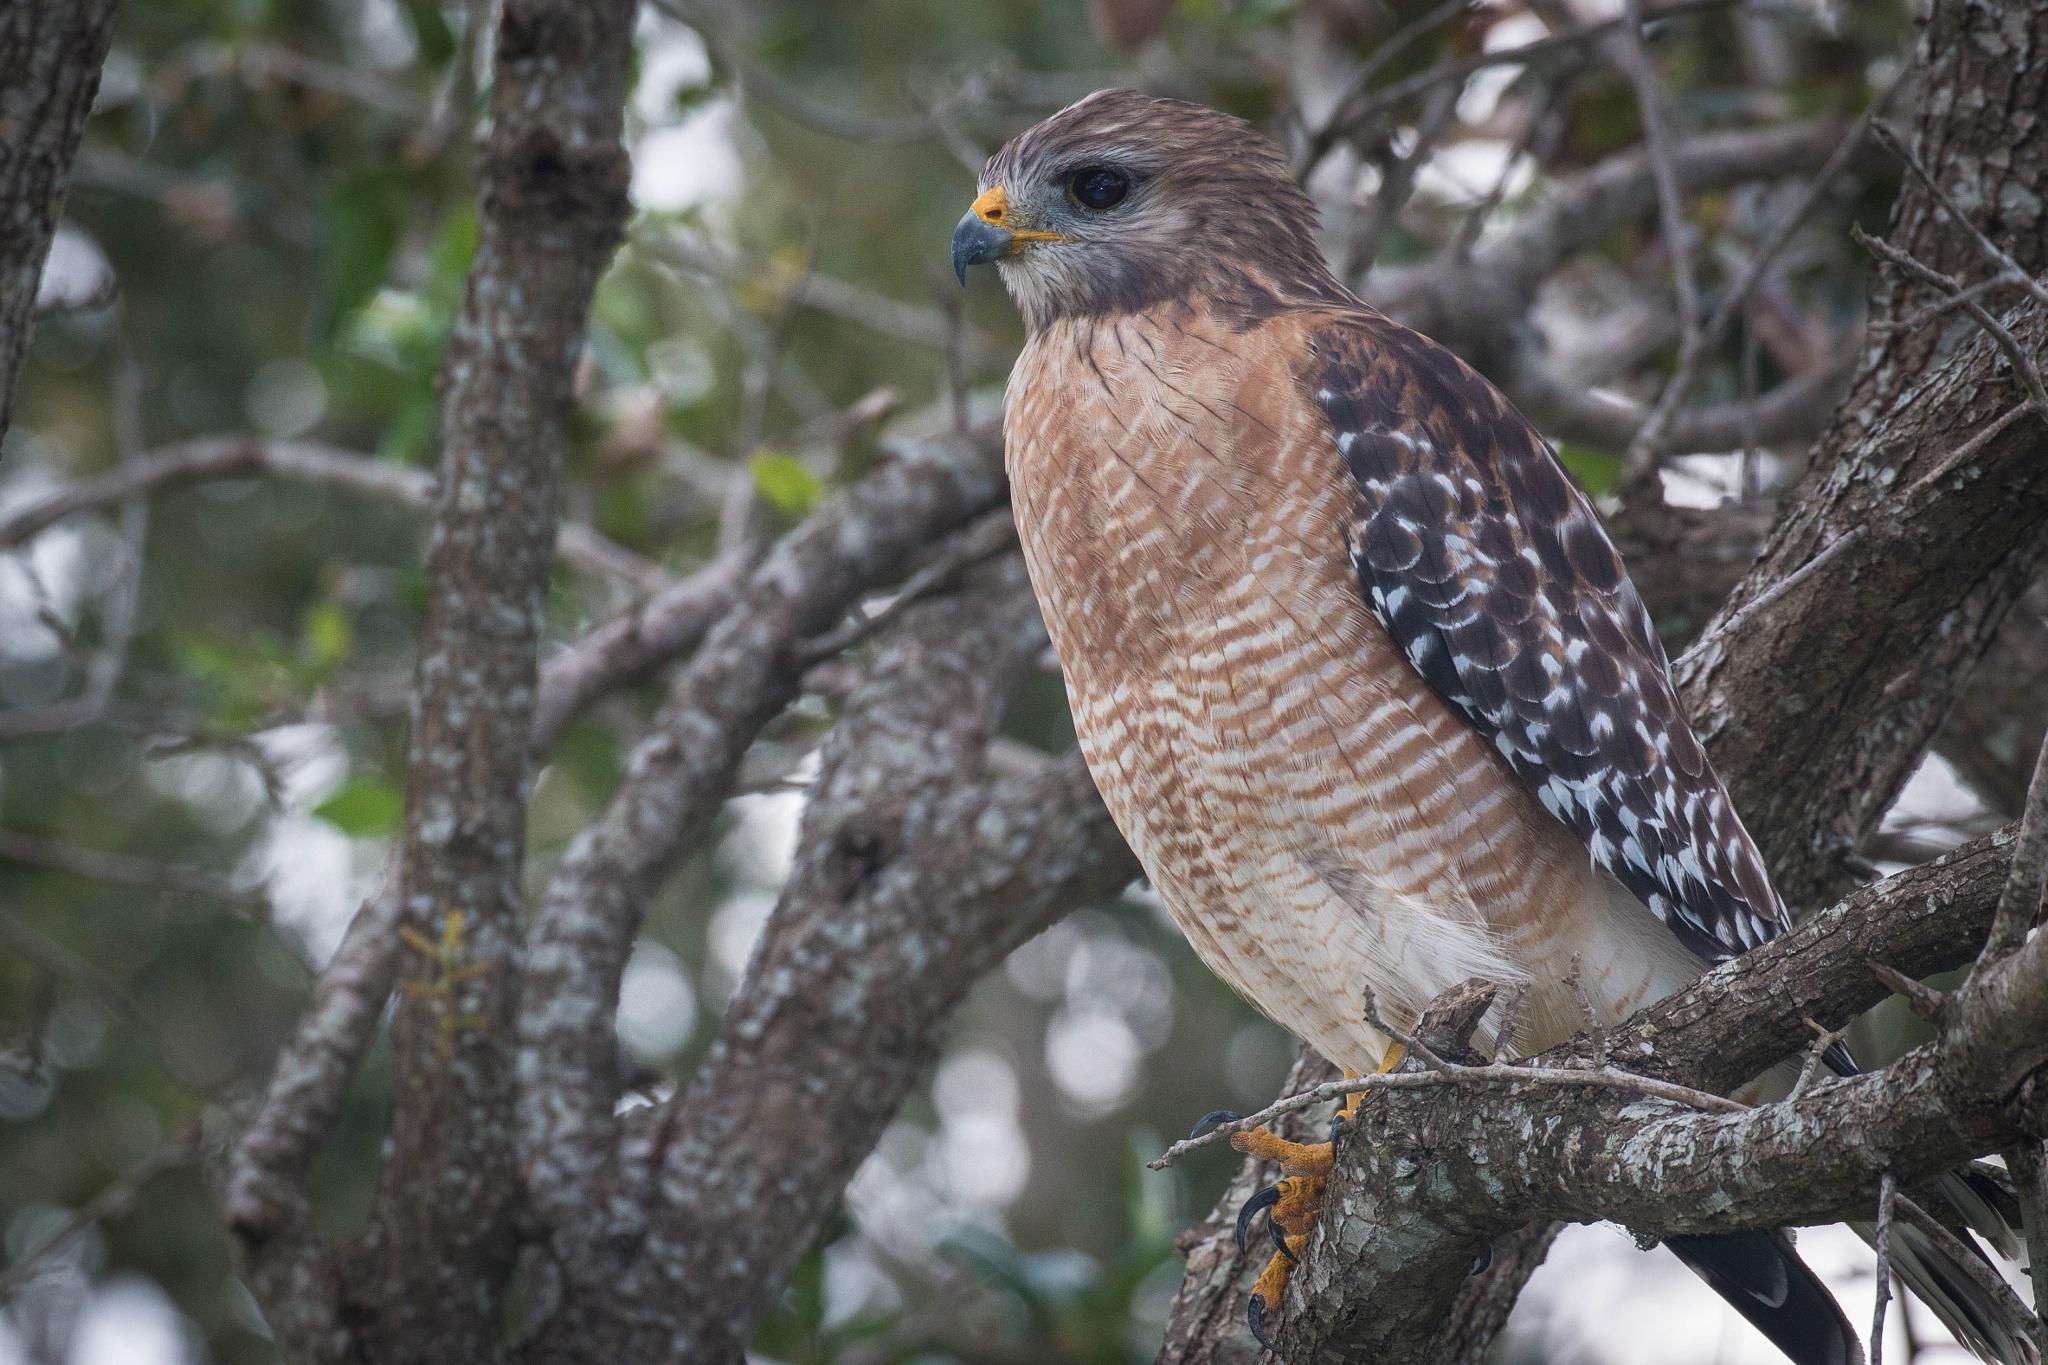 Red Shouldered Hawk by Brent Rosenthal